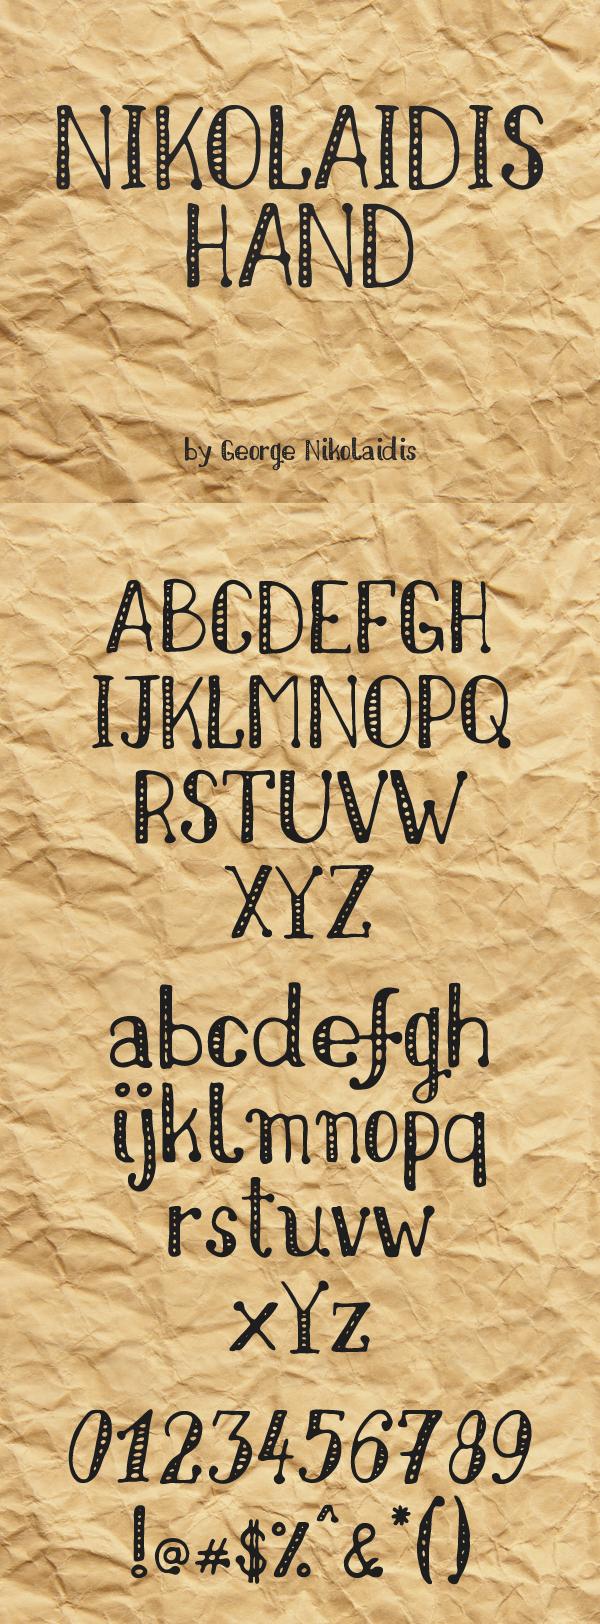 05 Nikolaidis Hand Free Font